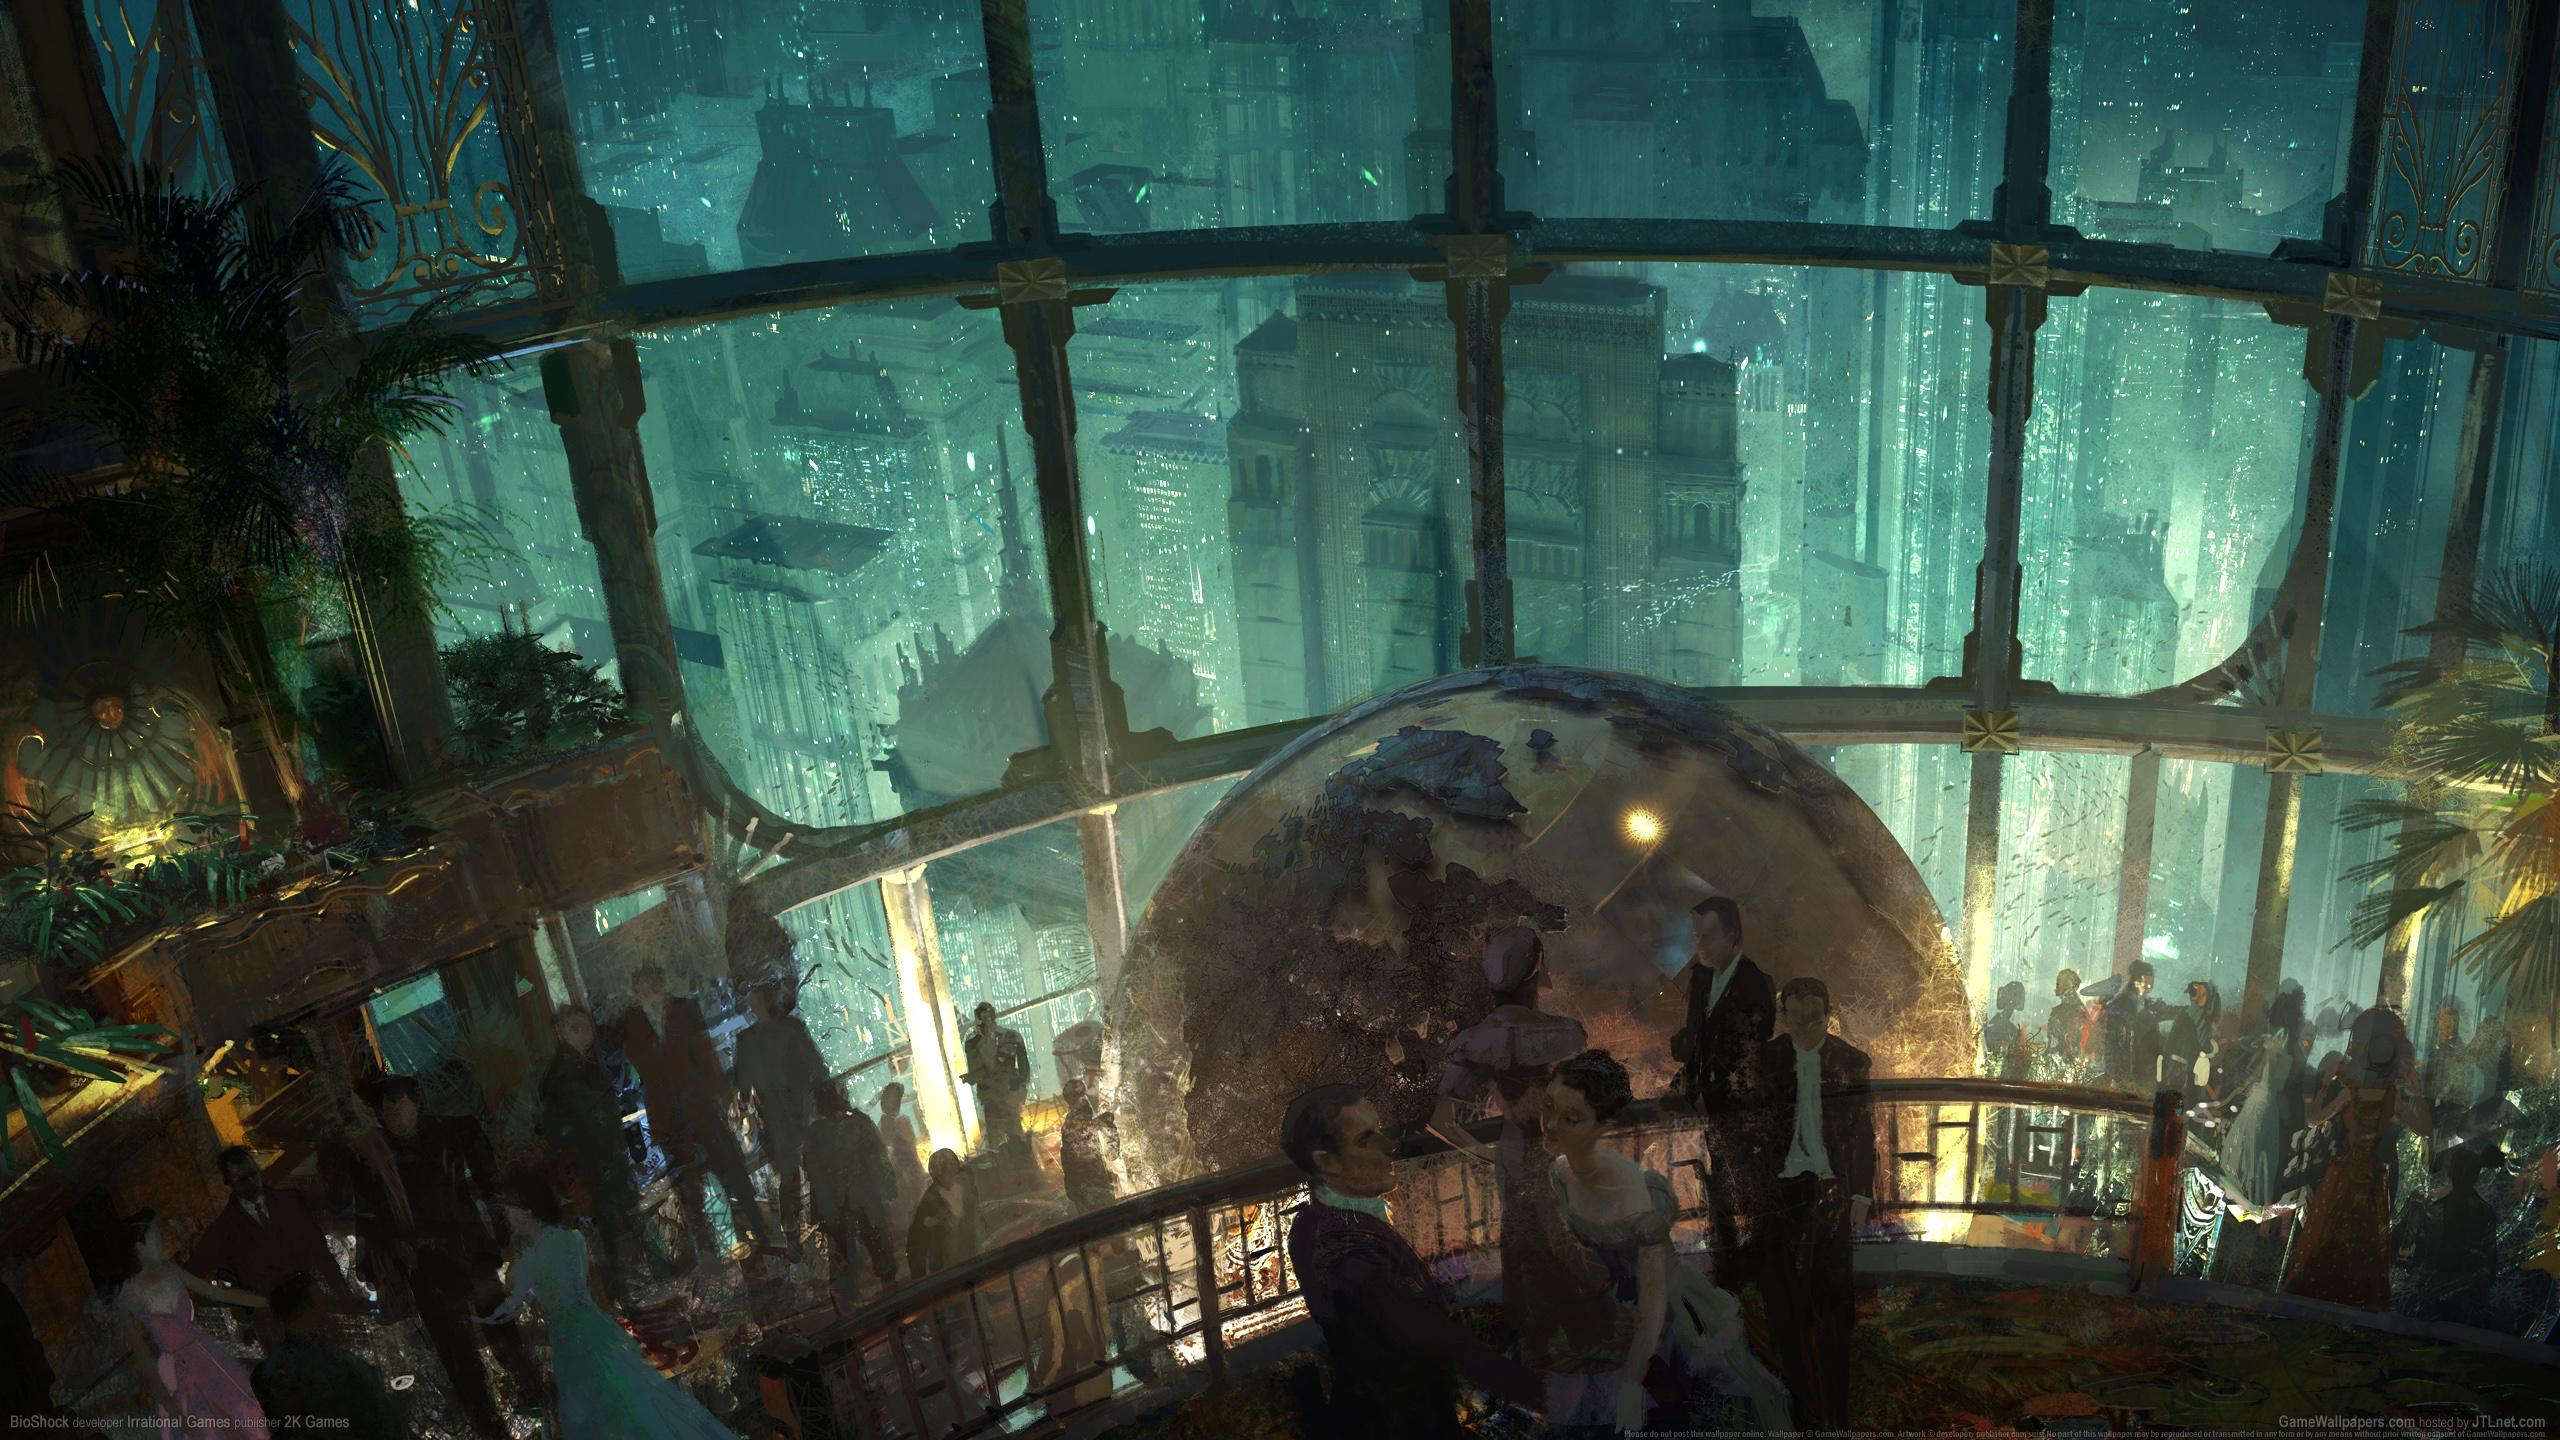 BioShock 2560x1440 Hintergrundbild 06